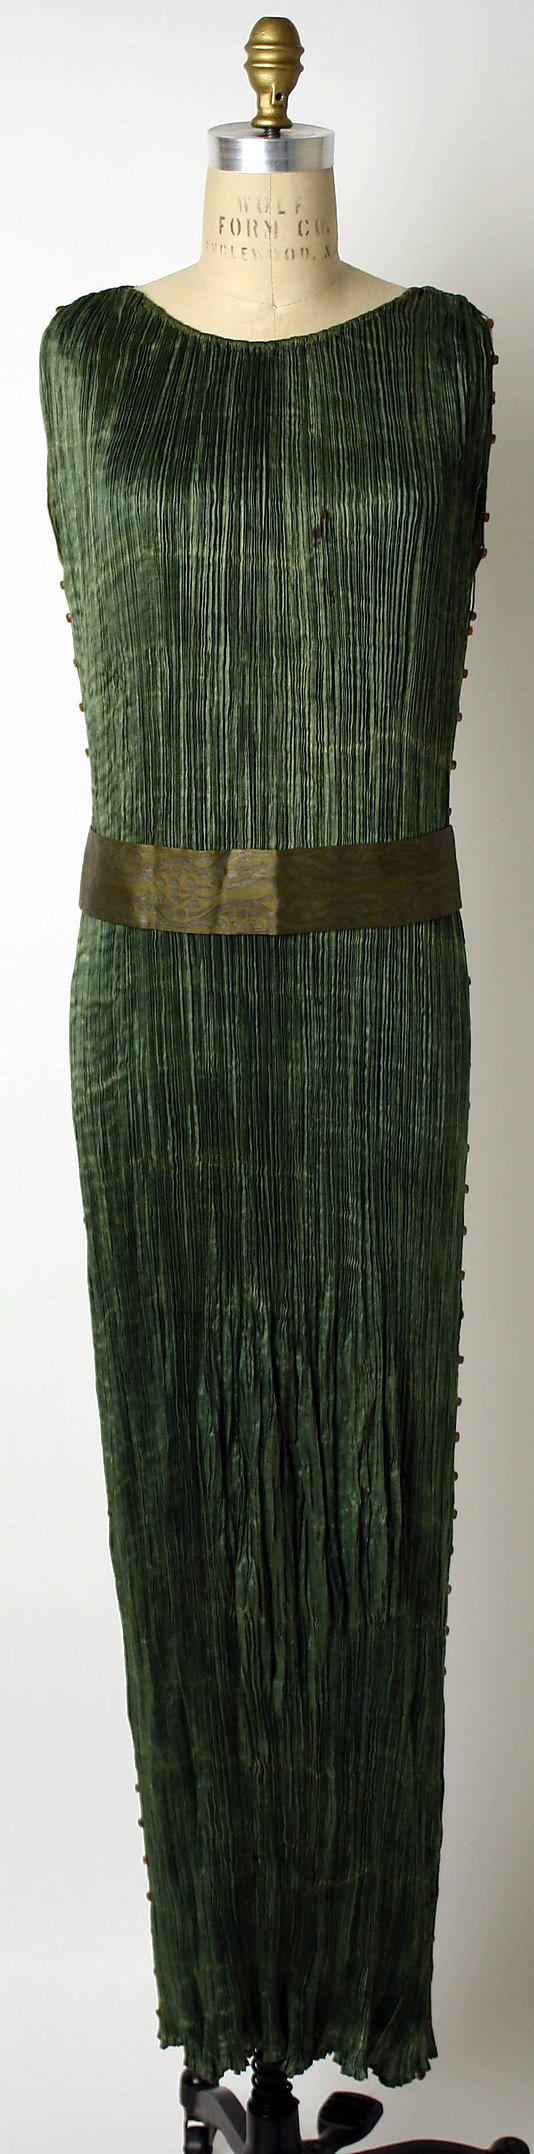 1000+ ideas about Spanish Dress on Pinterest